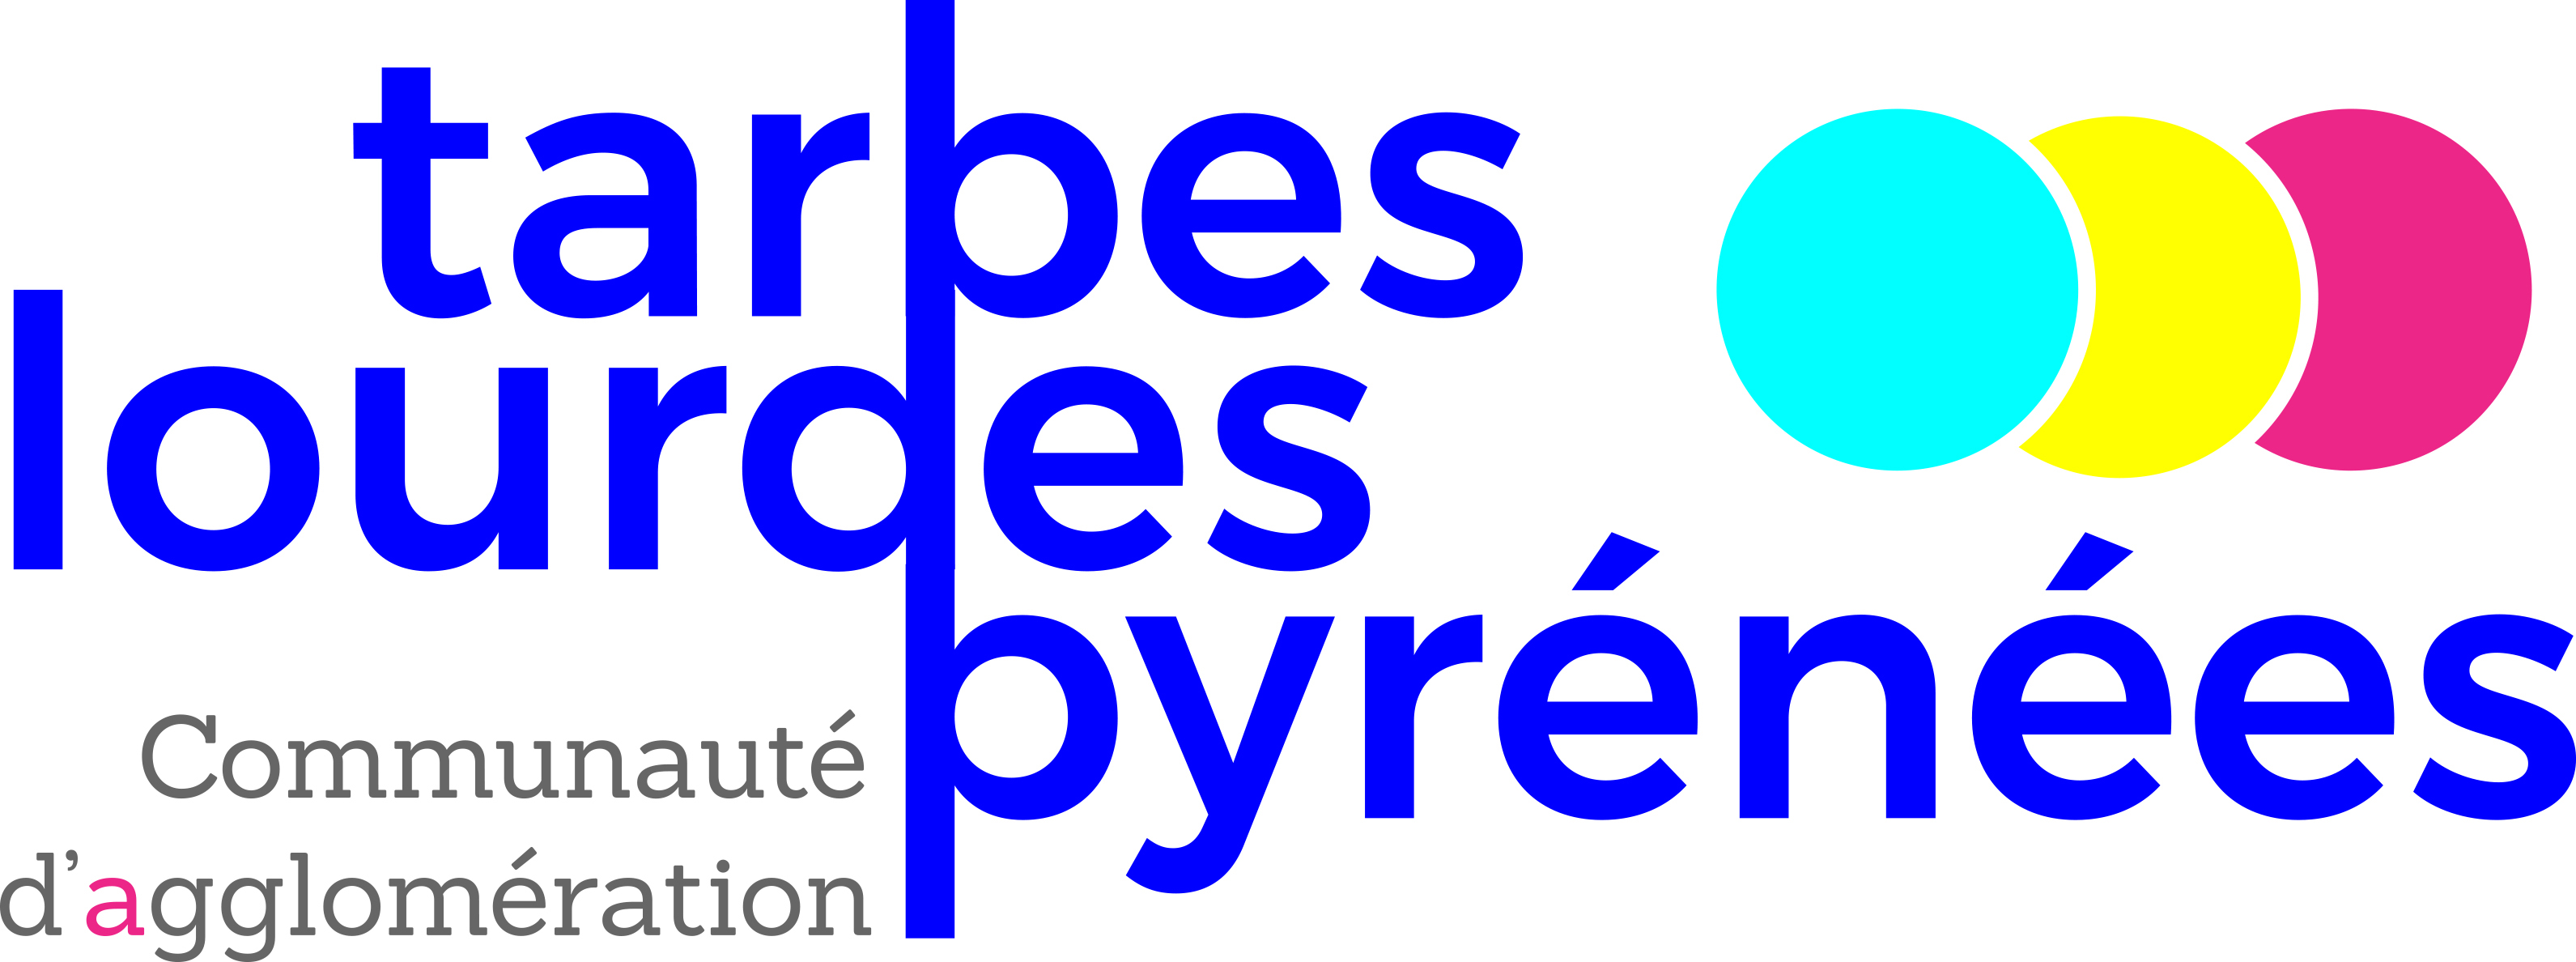 Tarbes Lourdes Pyrénées